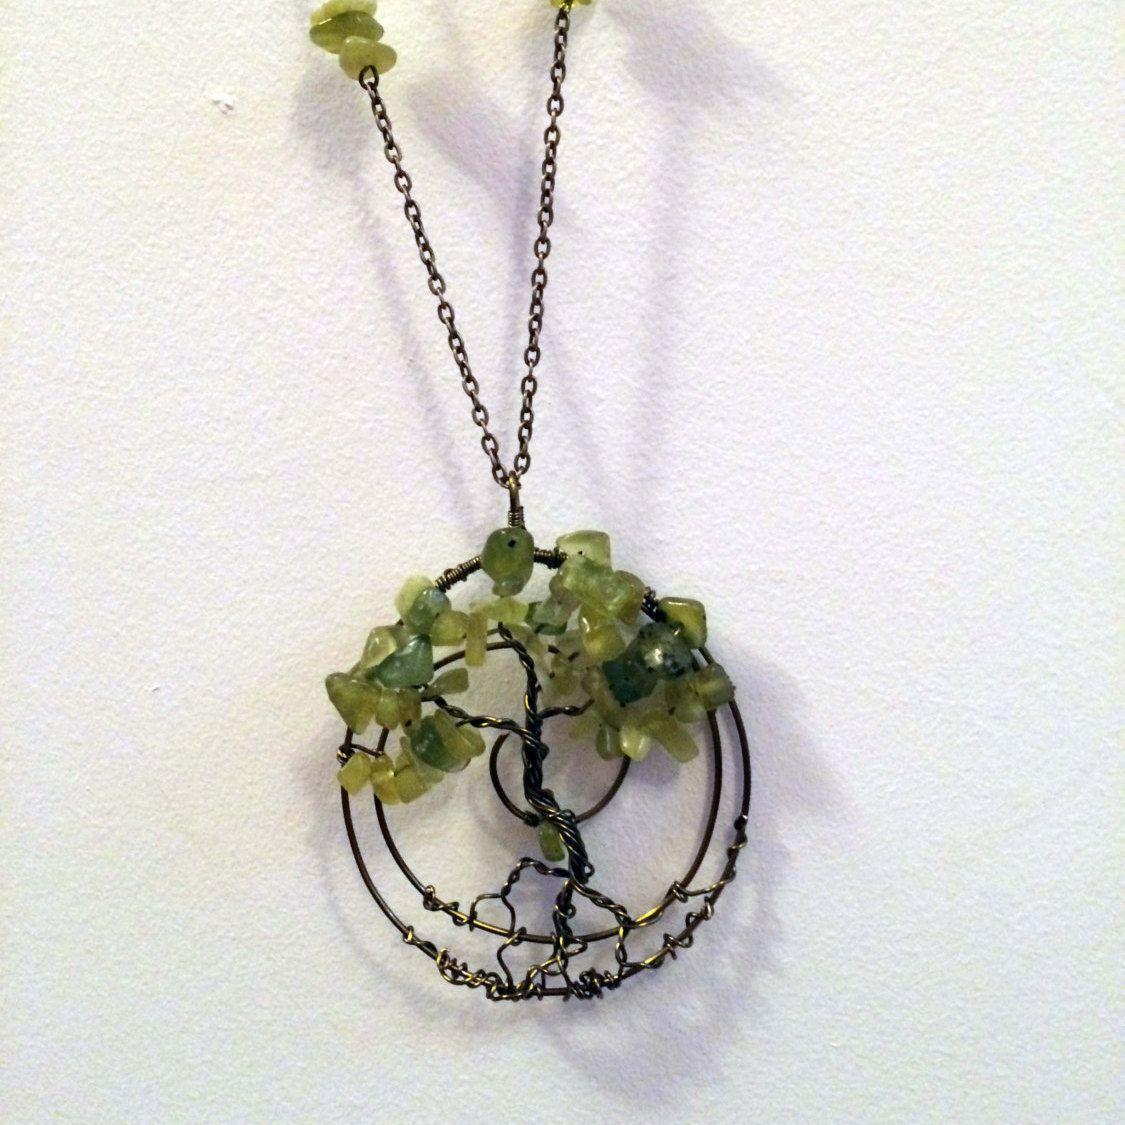 Spiritual Handmade Healing Olive Jade Gemstone Tree of Life Pendant Antique Bronze Wire Wrapped Necklace by GemstoneWireLove on Etsy